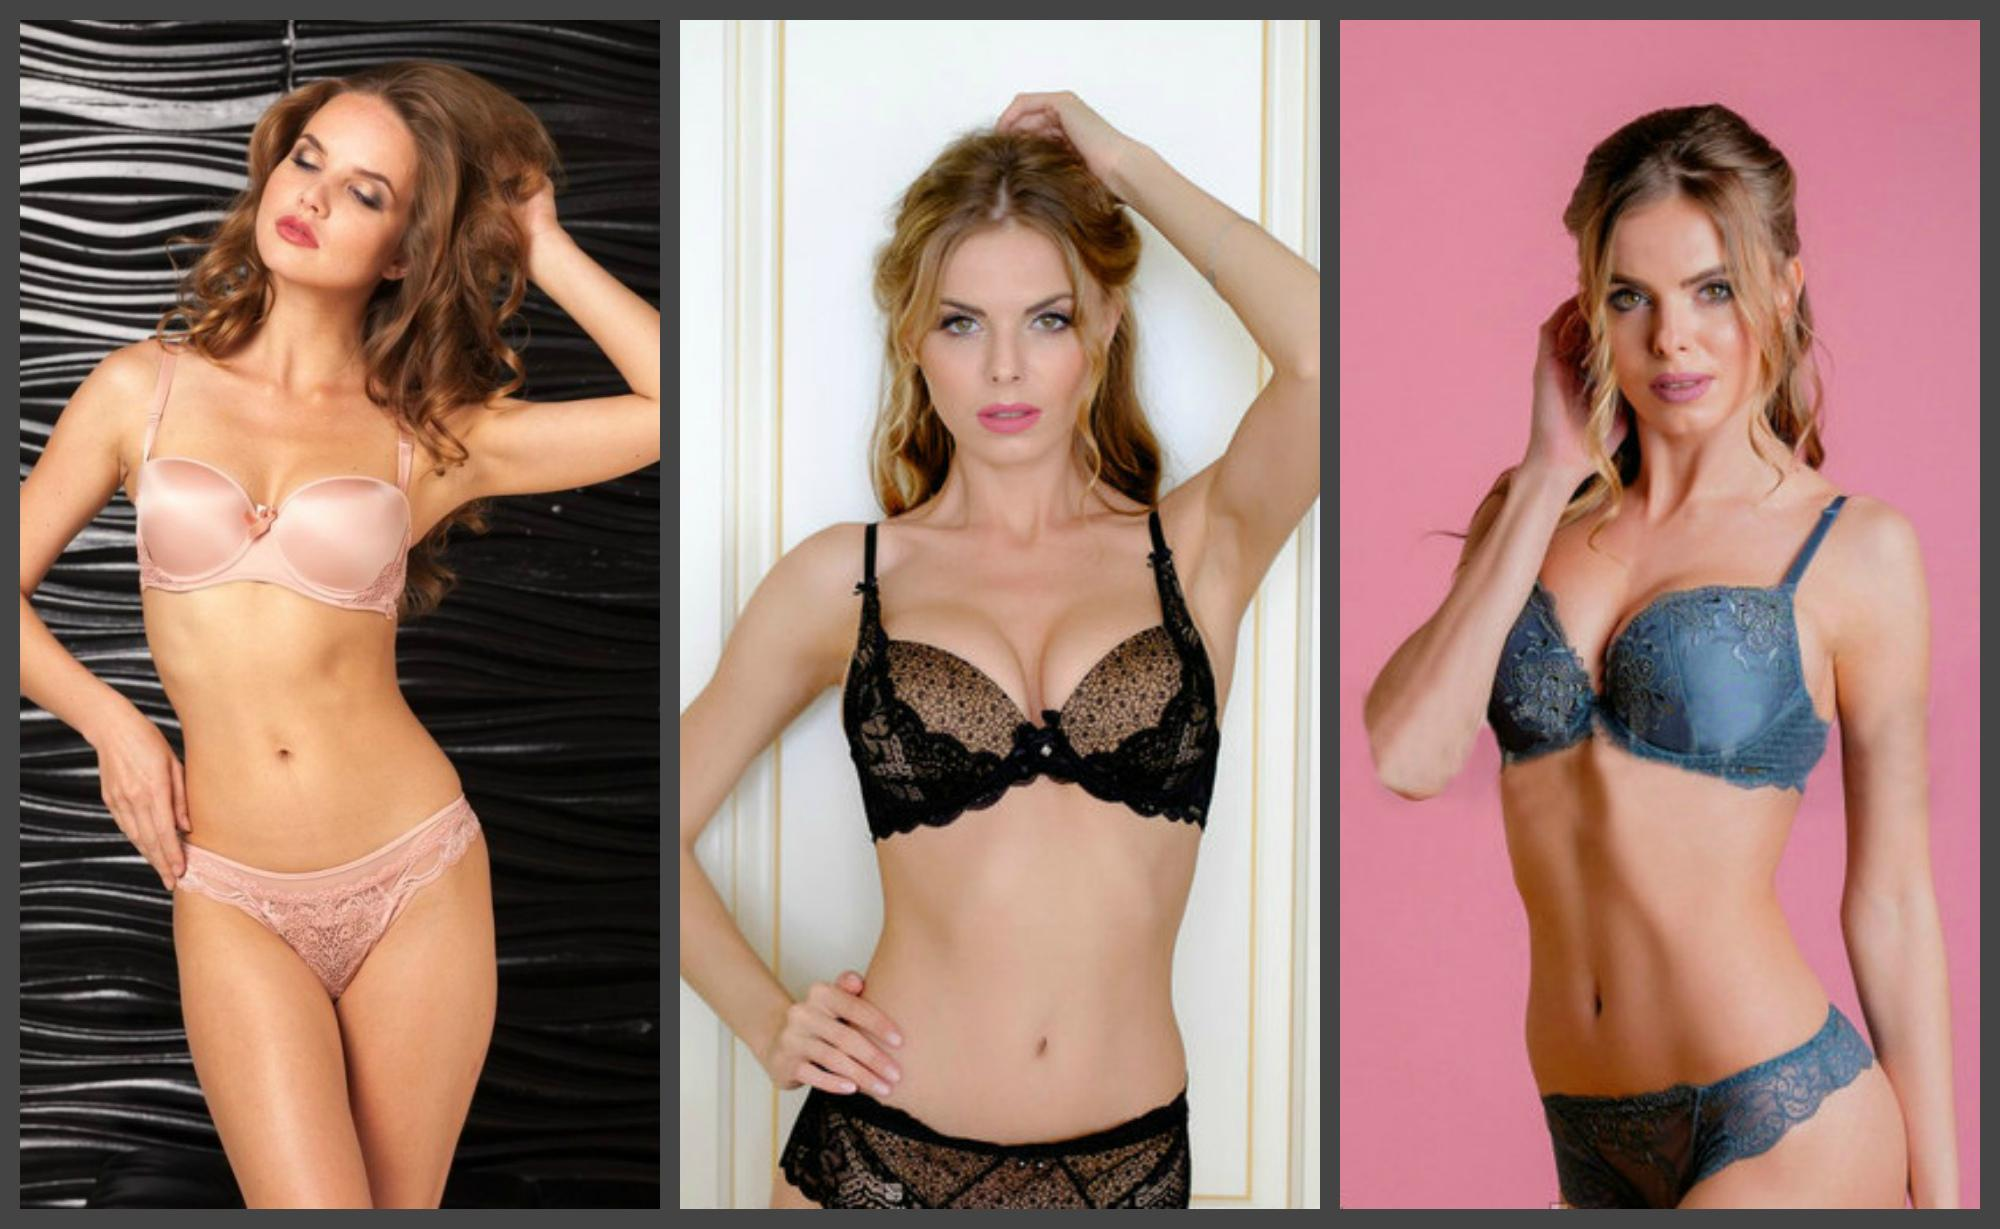 picture 1  picture 2. 1  2. Комплект женского нижнего белья Balaloum 9361  ... eb636d23cc0f8